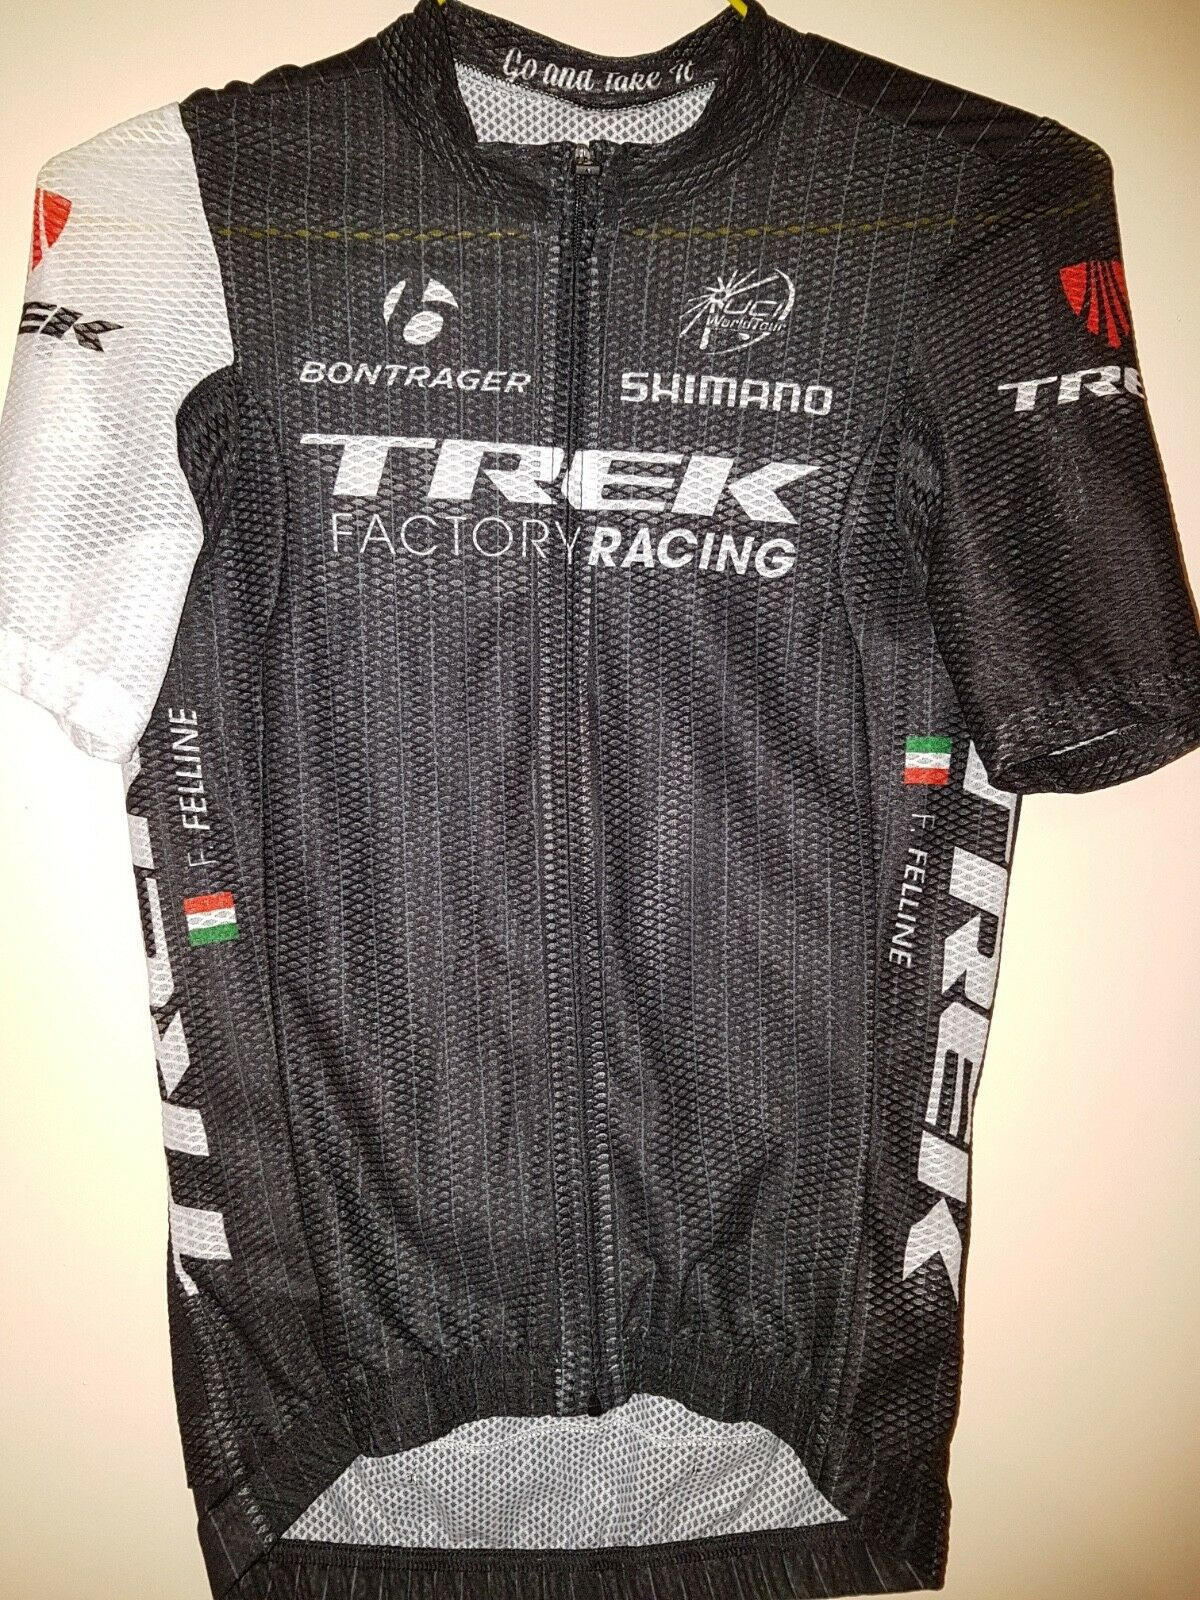 Maillot cycliste FELLINE cyclisme tour de france cycling jersey radtrikot